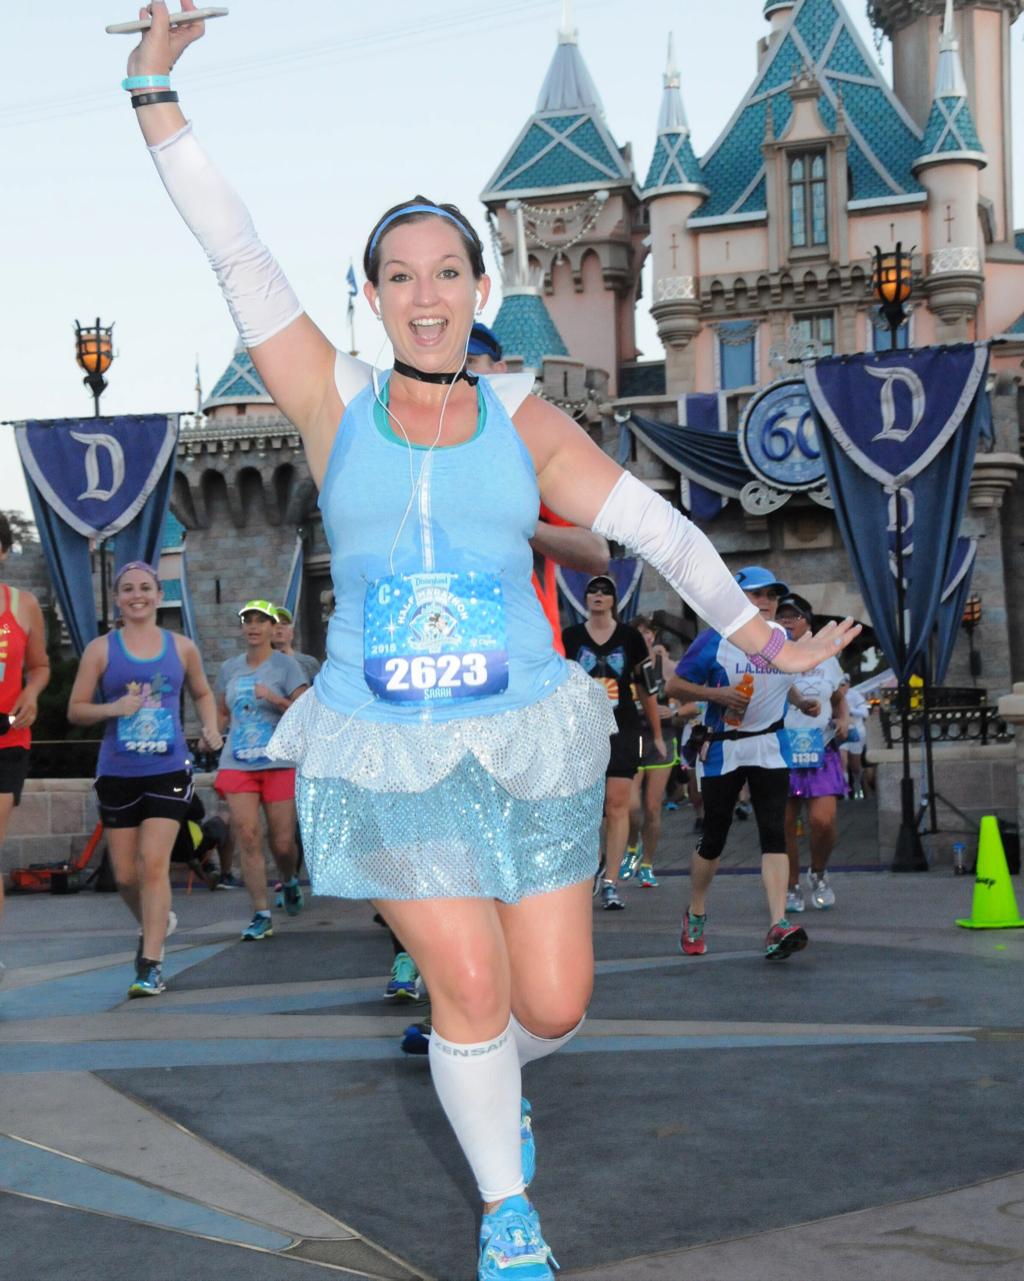 Ladies Womens Adult Monsters Inc Halloween Costume Run ... |Disney Running Costumes Ideas Women